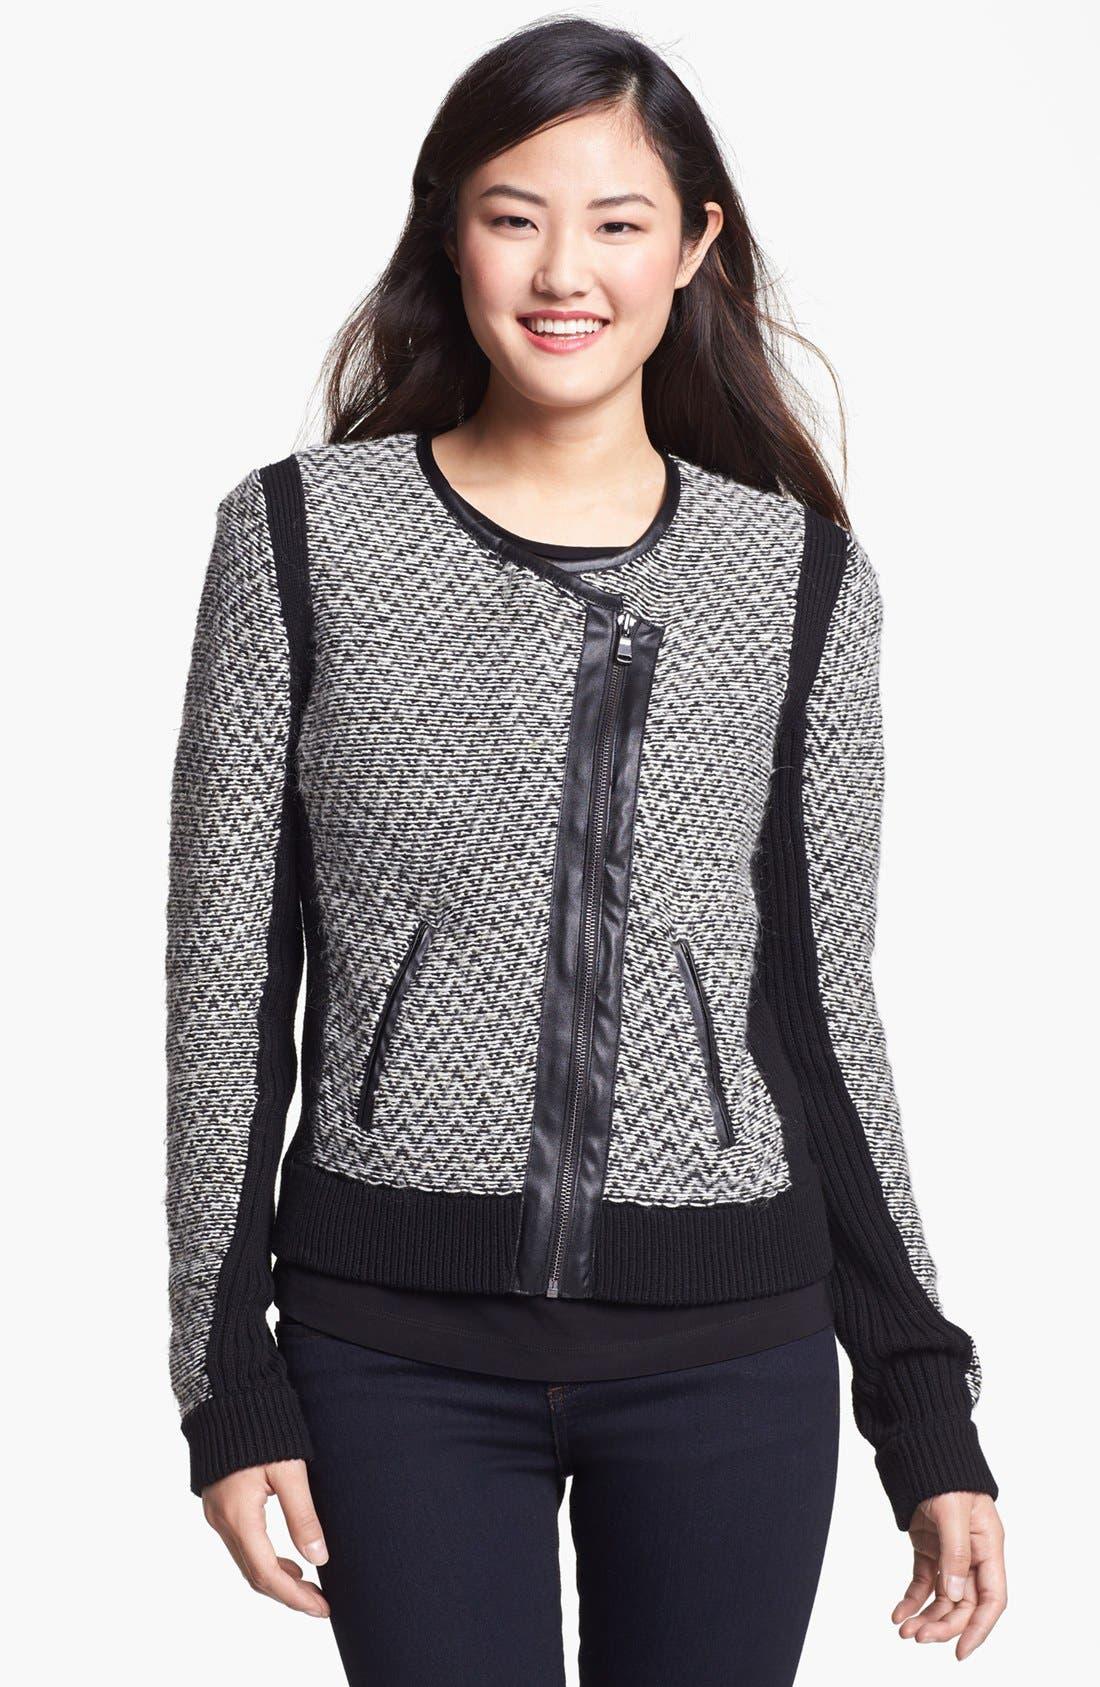 Alternate Image 1 Selected - Vince Camuto Knit Moto Jacket